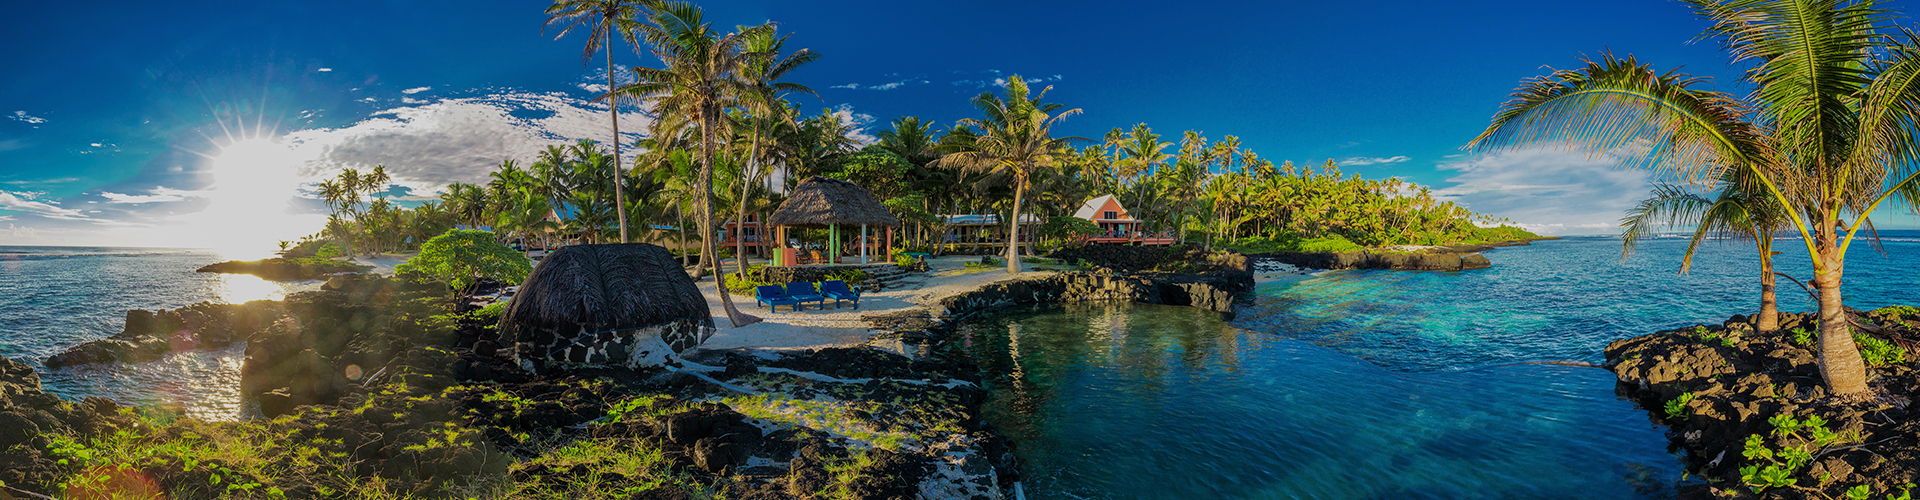 Landmark photograph of Samoa